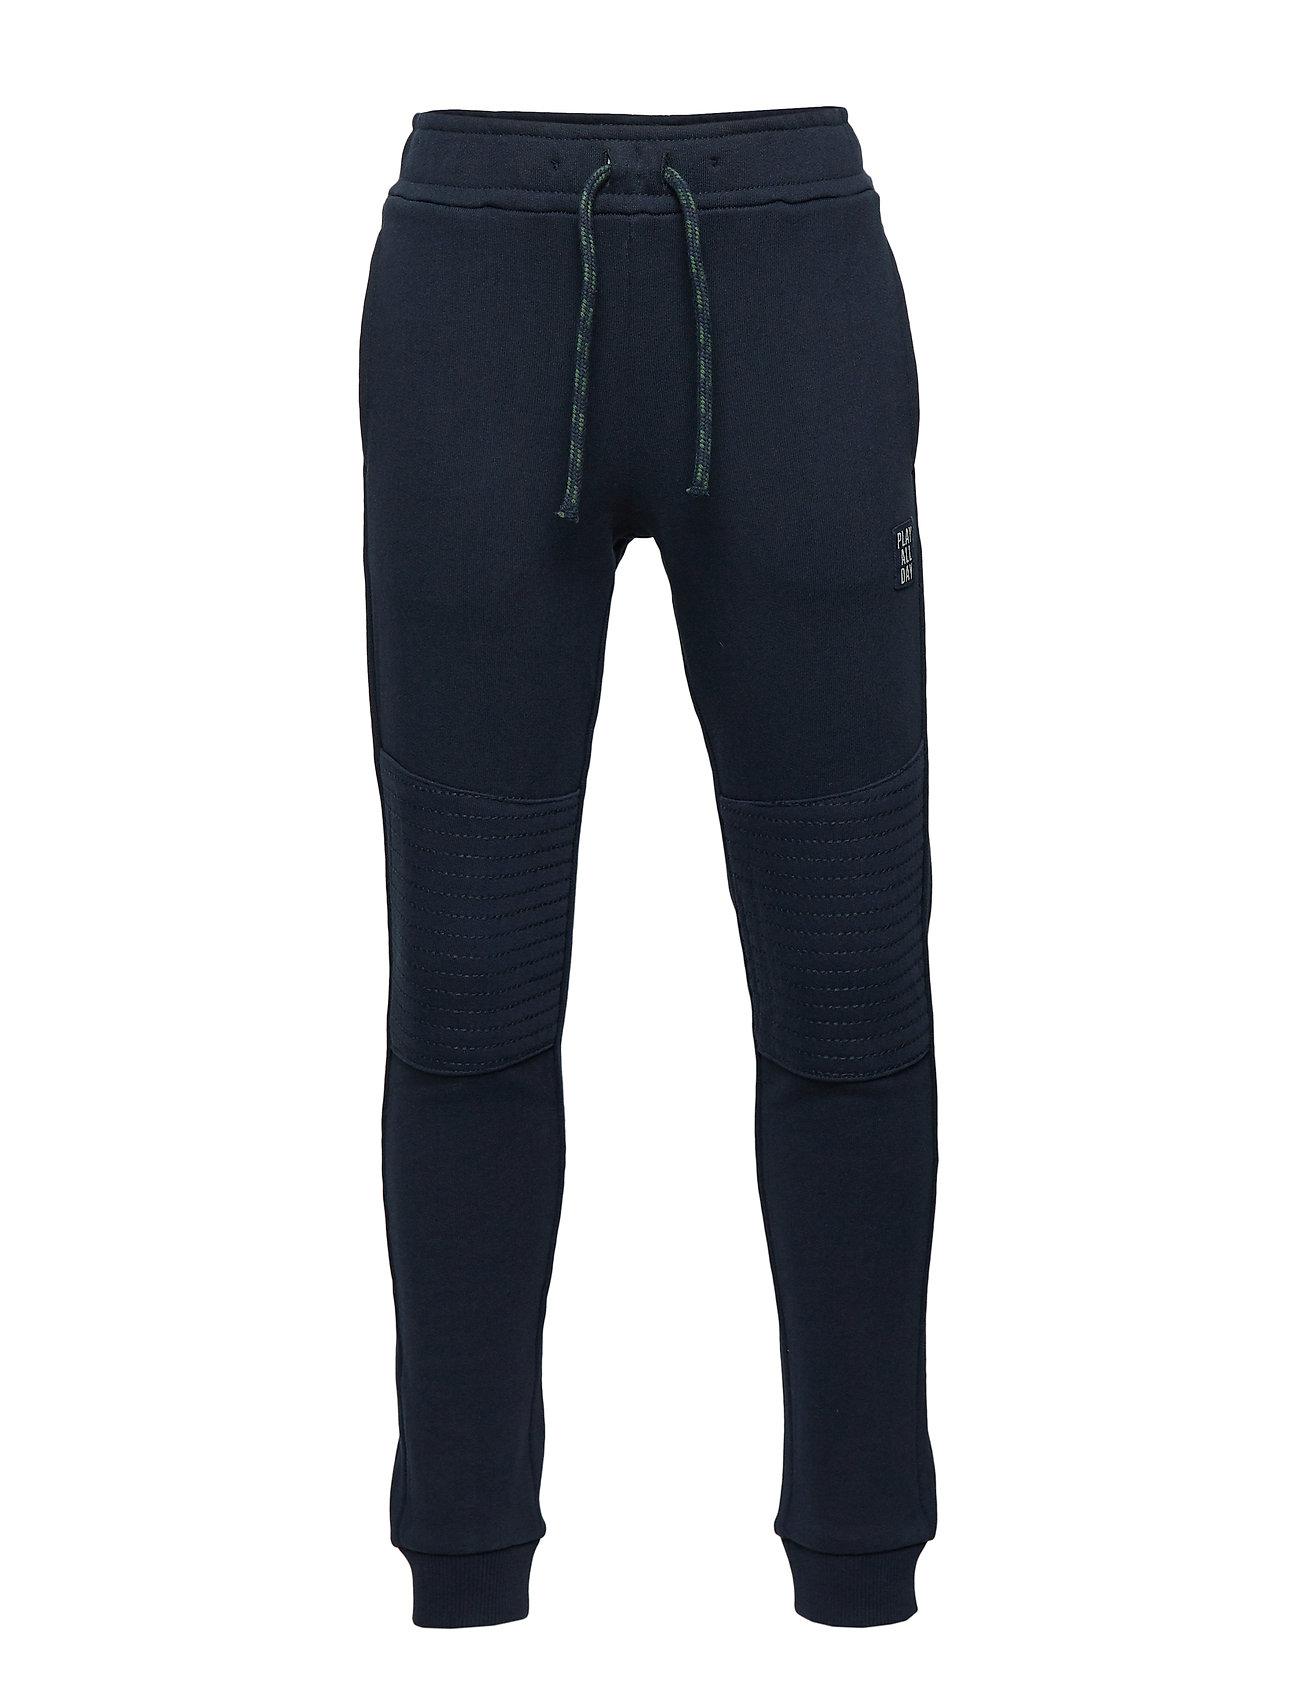 Lindex Sweatpants with reinforced knees - DARK NAVY